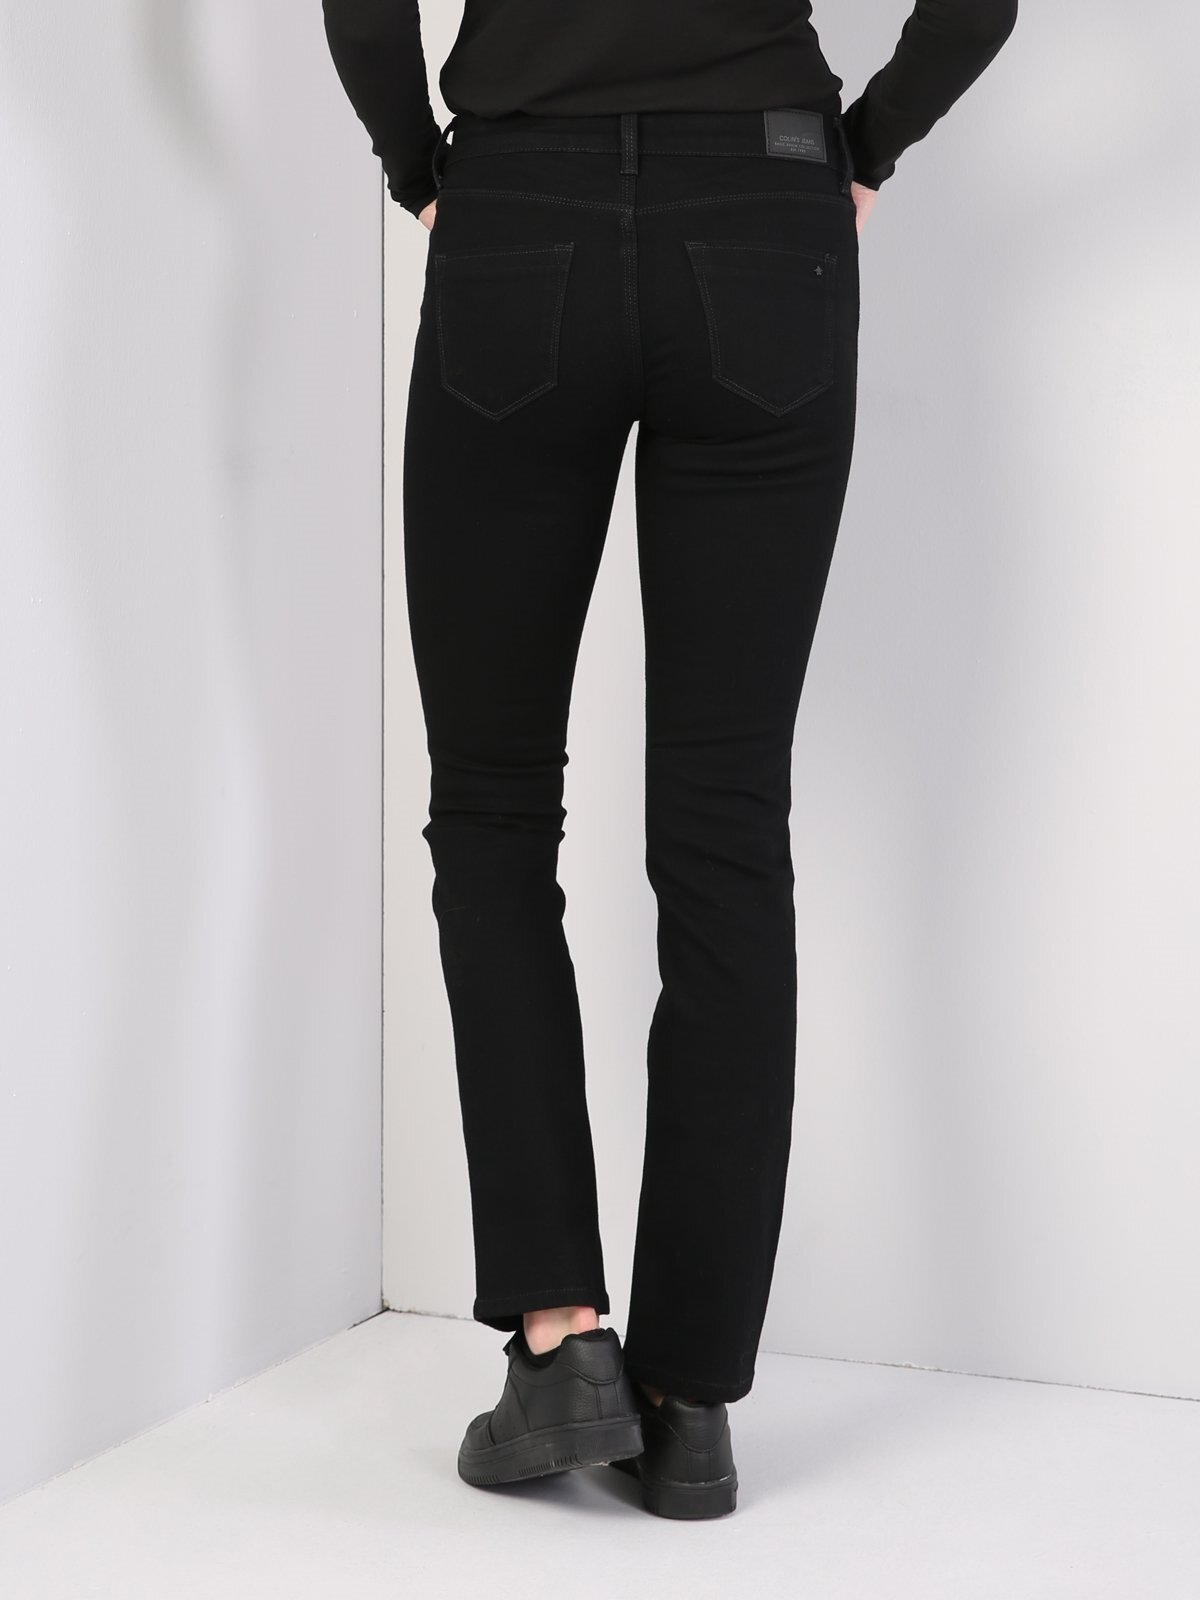 792 Mıla Regular Fit Orta Bel Düz Paça  Kadın Siyah Jean Pantolon